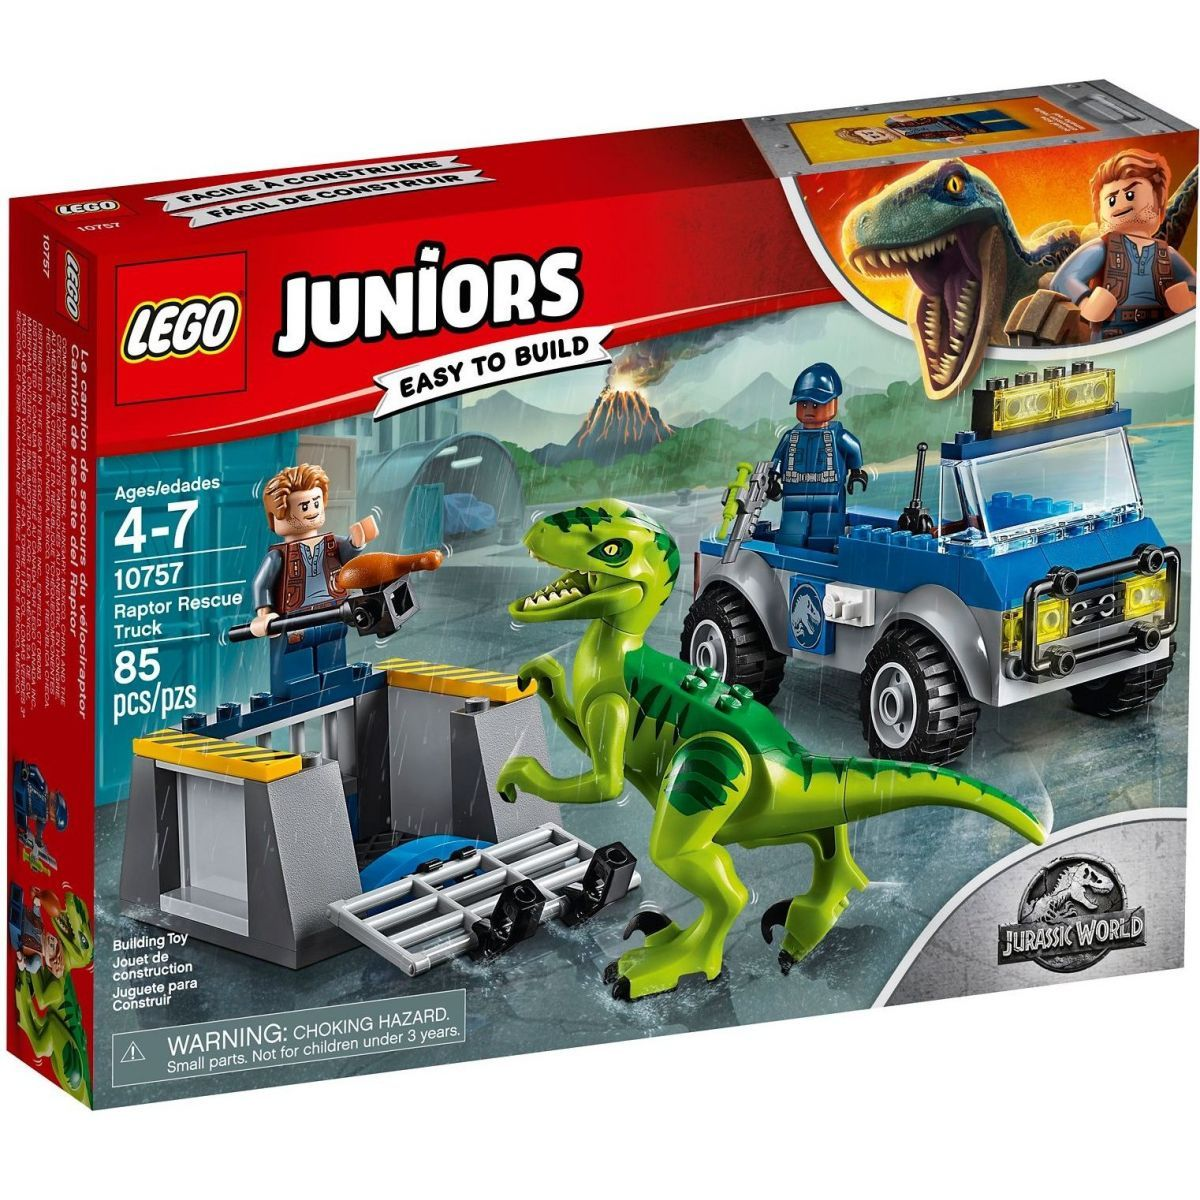 LEGO Juniors 10757 Jurassic World Vozidlo pro záchranu Raptora